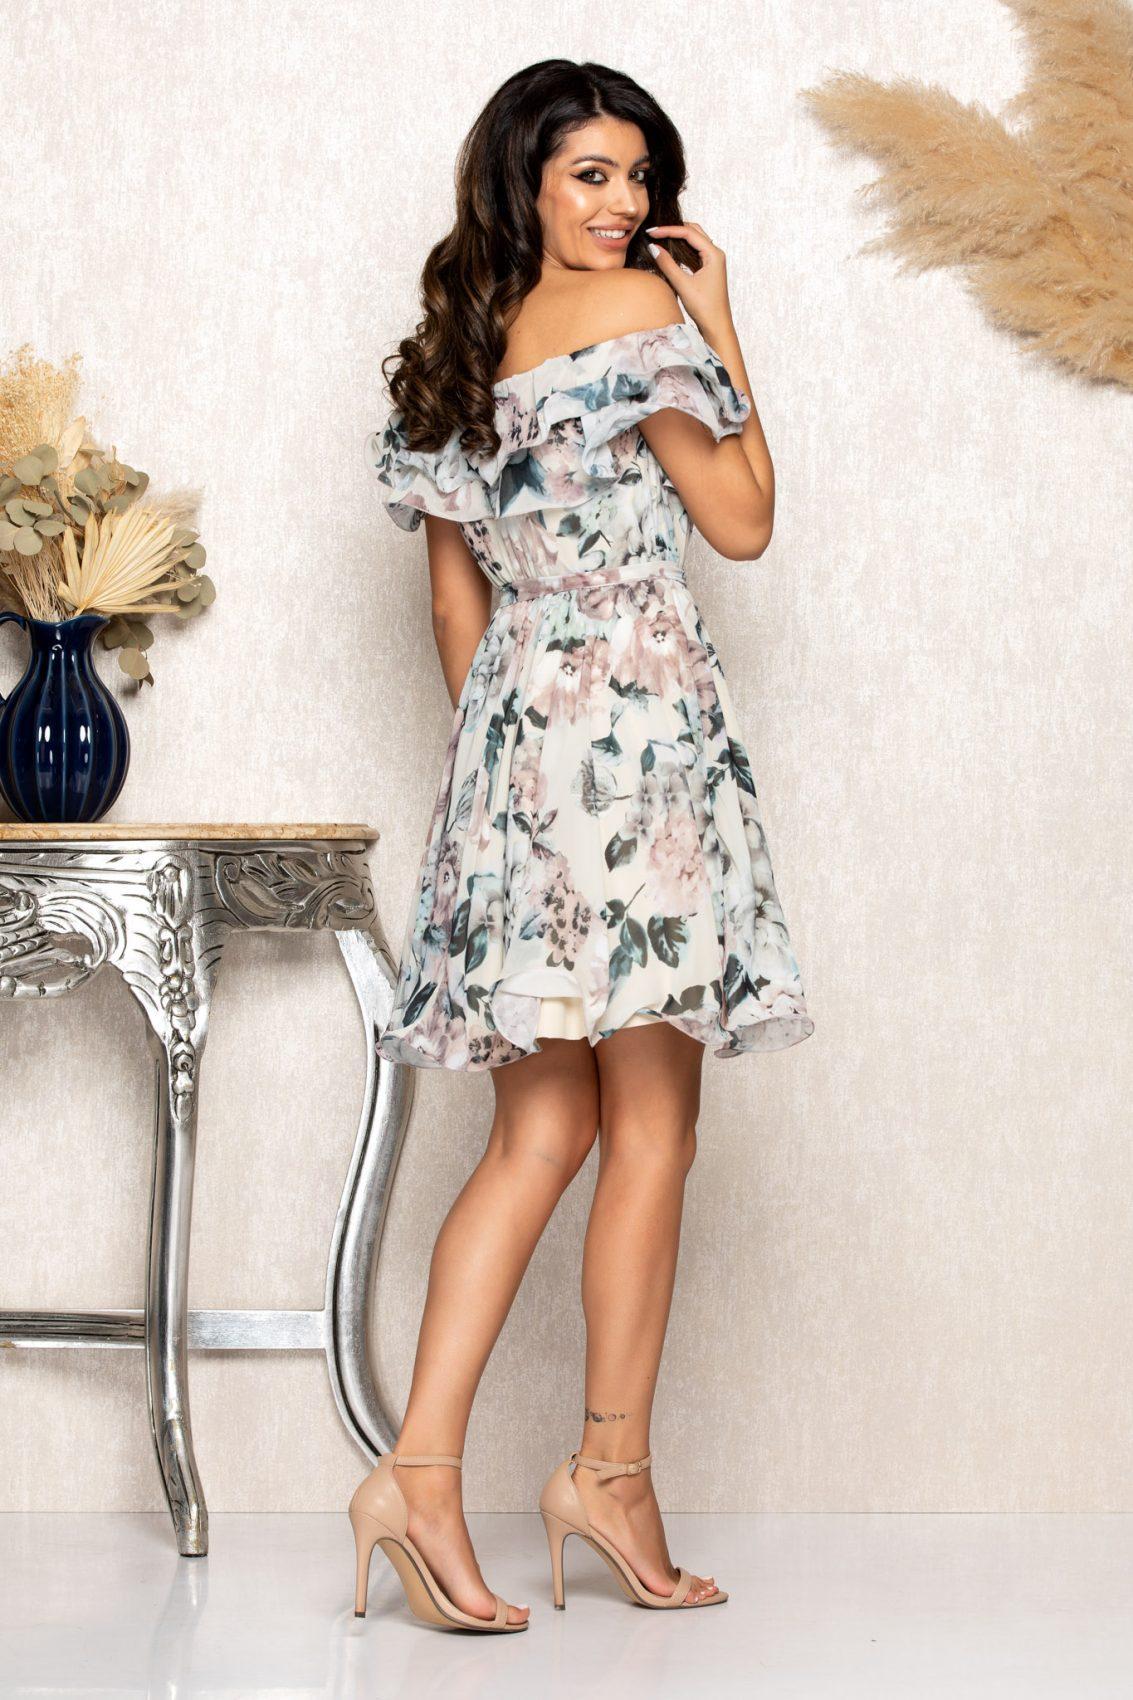 Nude Φλοράλ Φόρεμα Beatrice B117 2